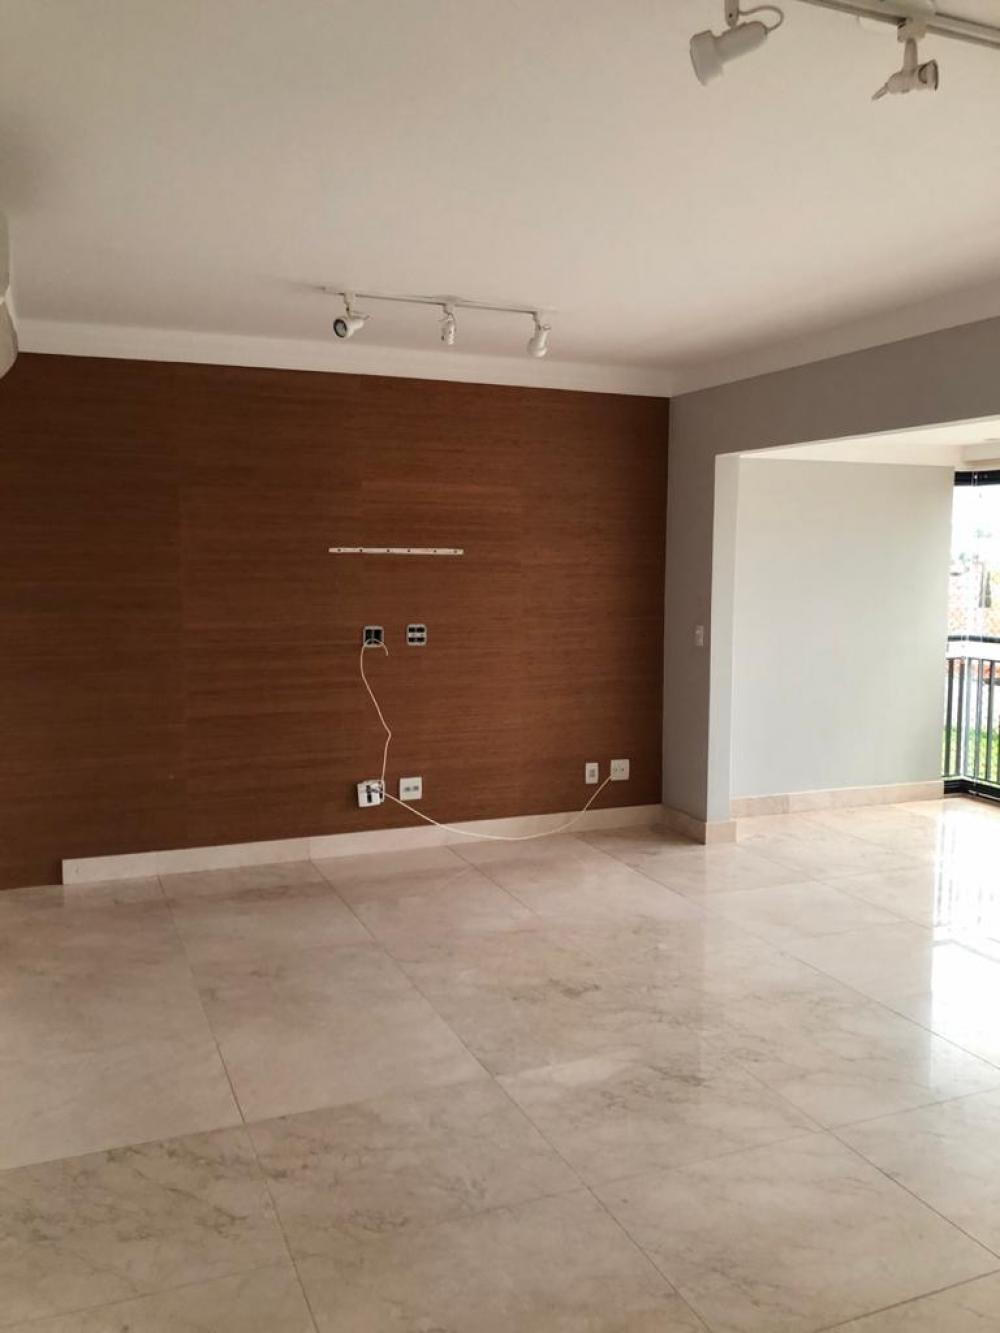 Sao Jose do Rio Preto Apartamento Venda R$780.000,00 Condominio R$850,00 3 Dormitorios 2 Vagas Area construida 163.00m2